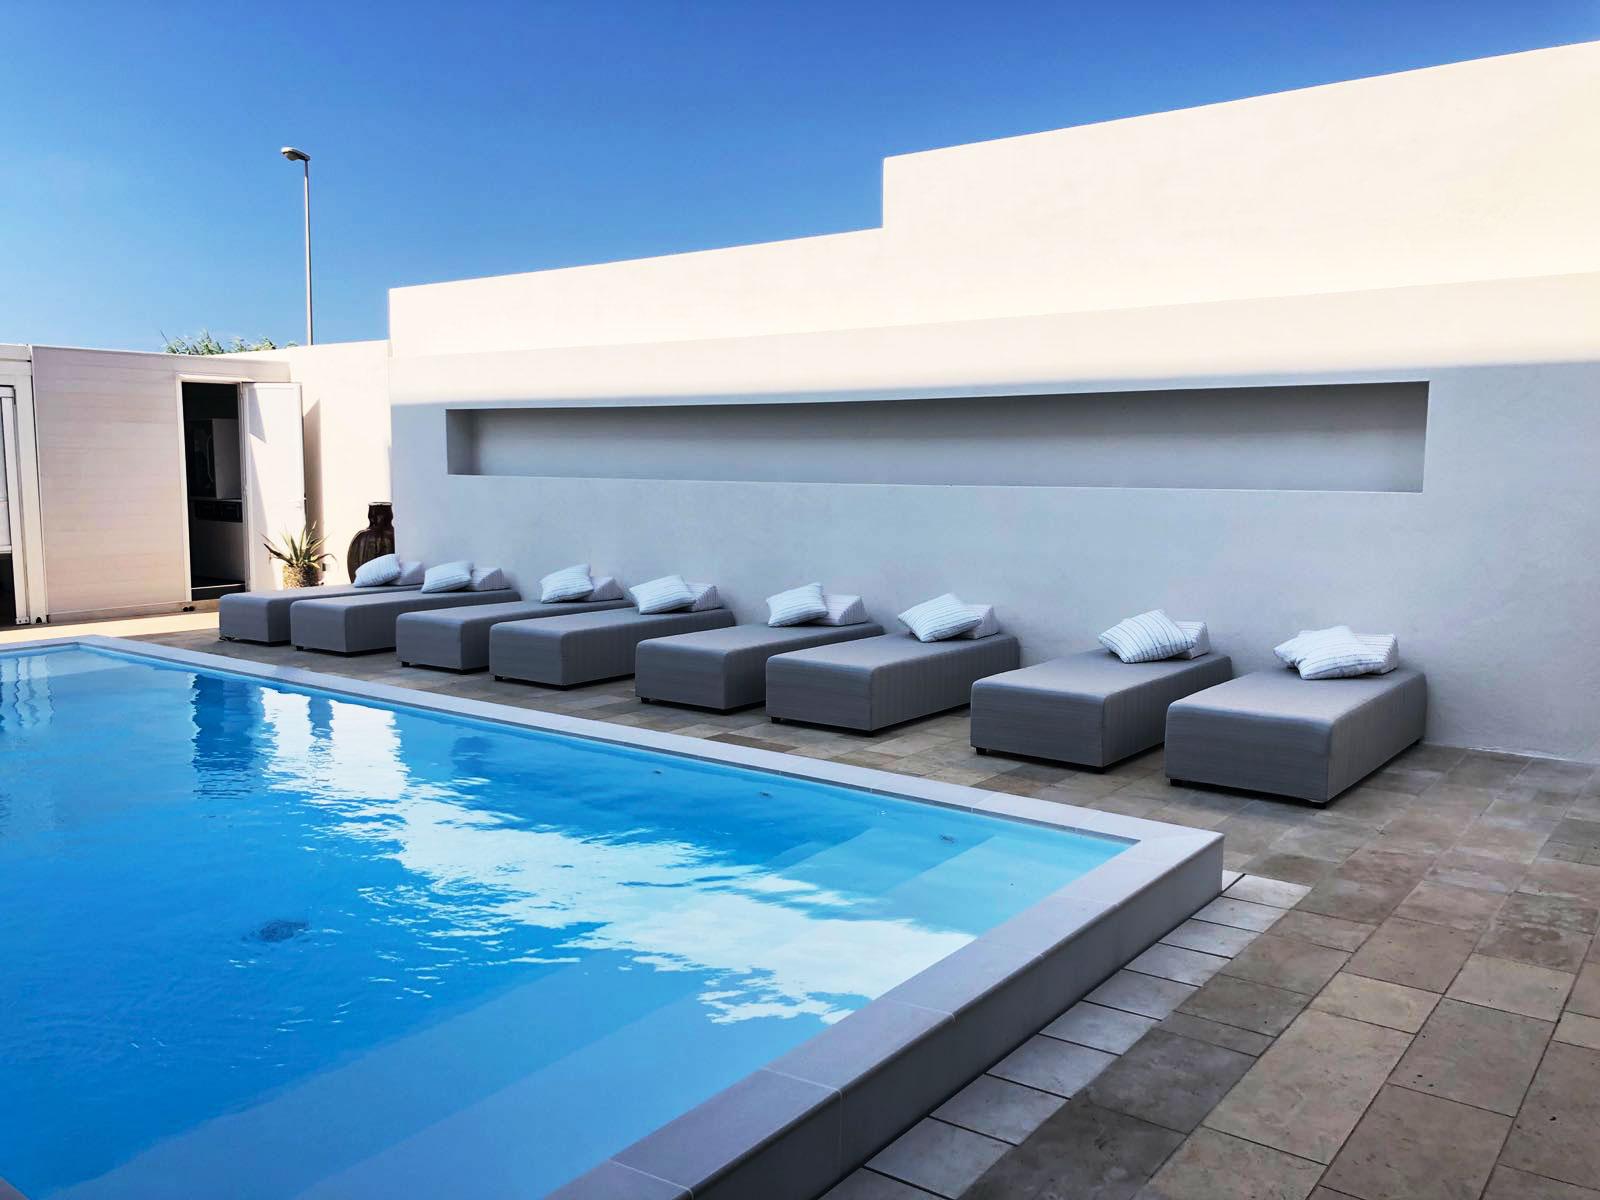 piscina-interna-hotel-la-conca1